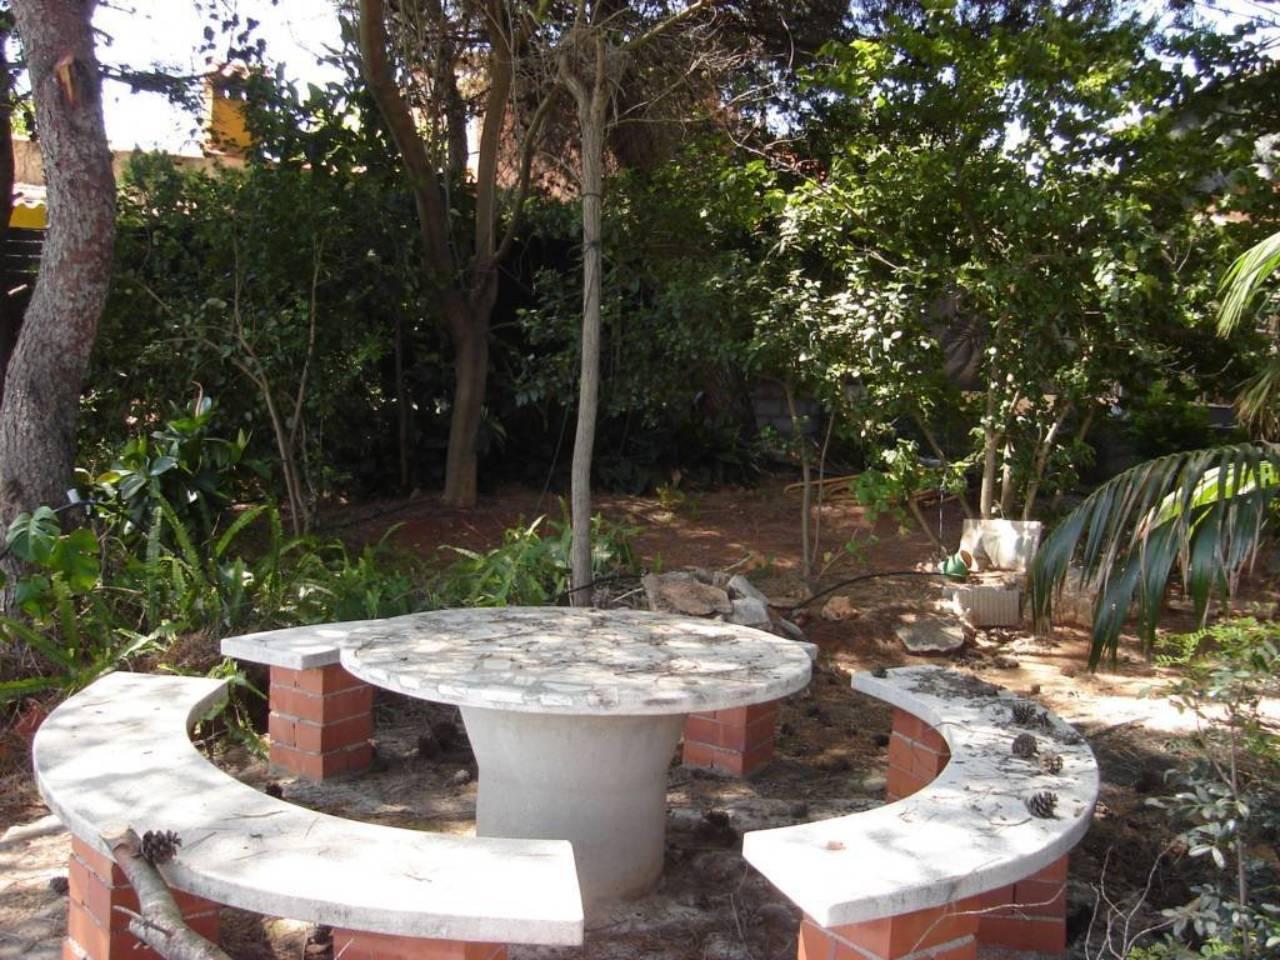 Casa  Urbanización redonda. 10520 m² solar,  2 habitaciones (2 dobles),  1 baño, alumbrado,